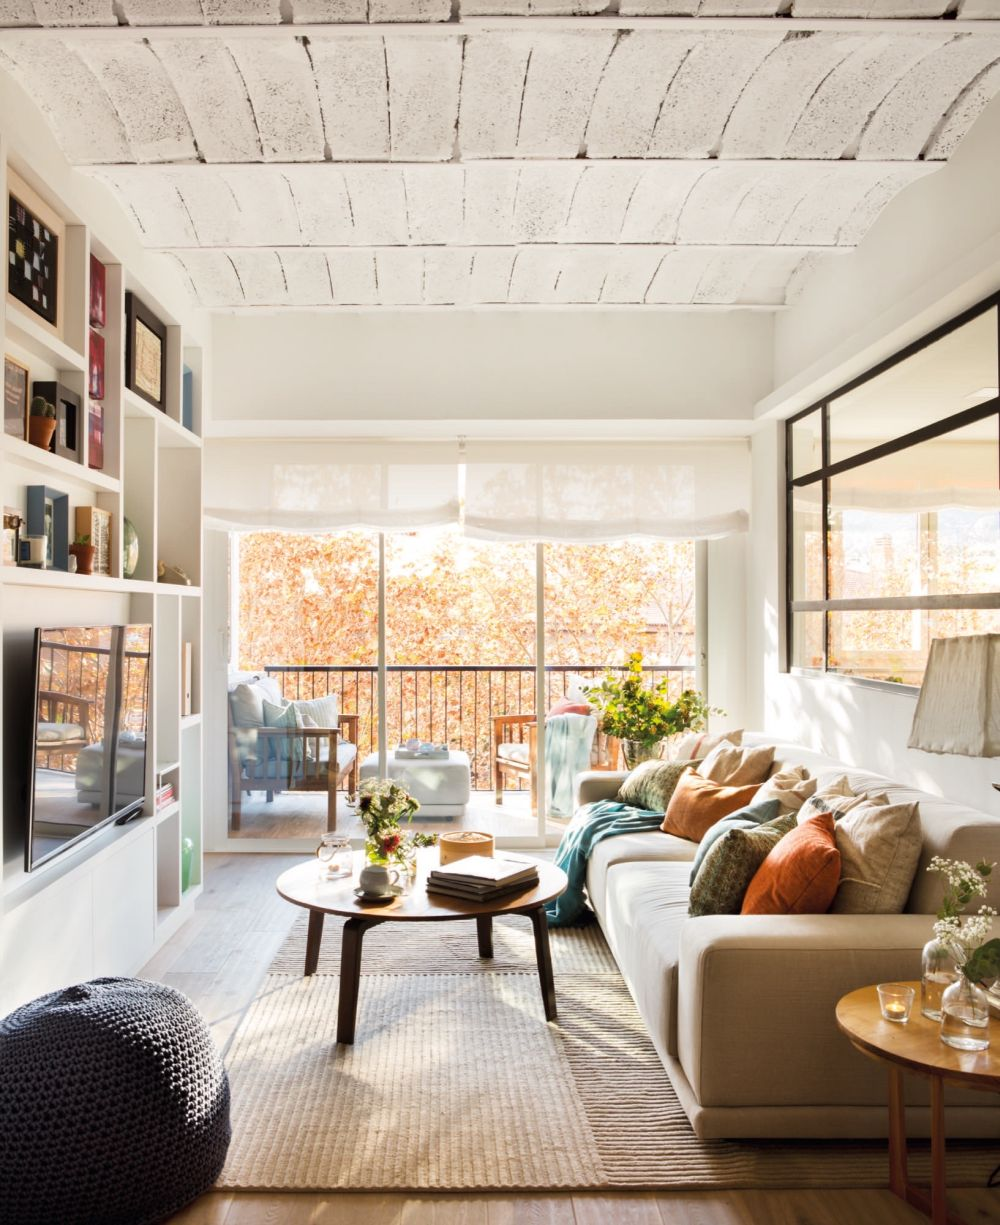 adelaparvu.com despre reamenajare apartament de 60 mp, Designer Pia Cadevila, Foto Pepa Oromi, ElMueble (12)